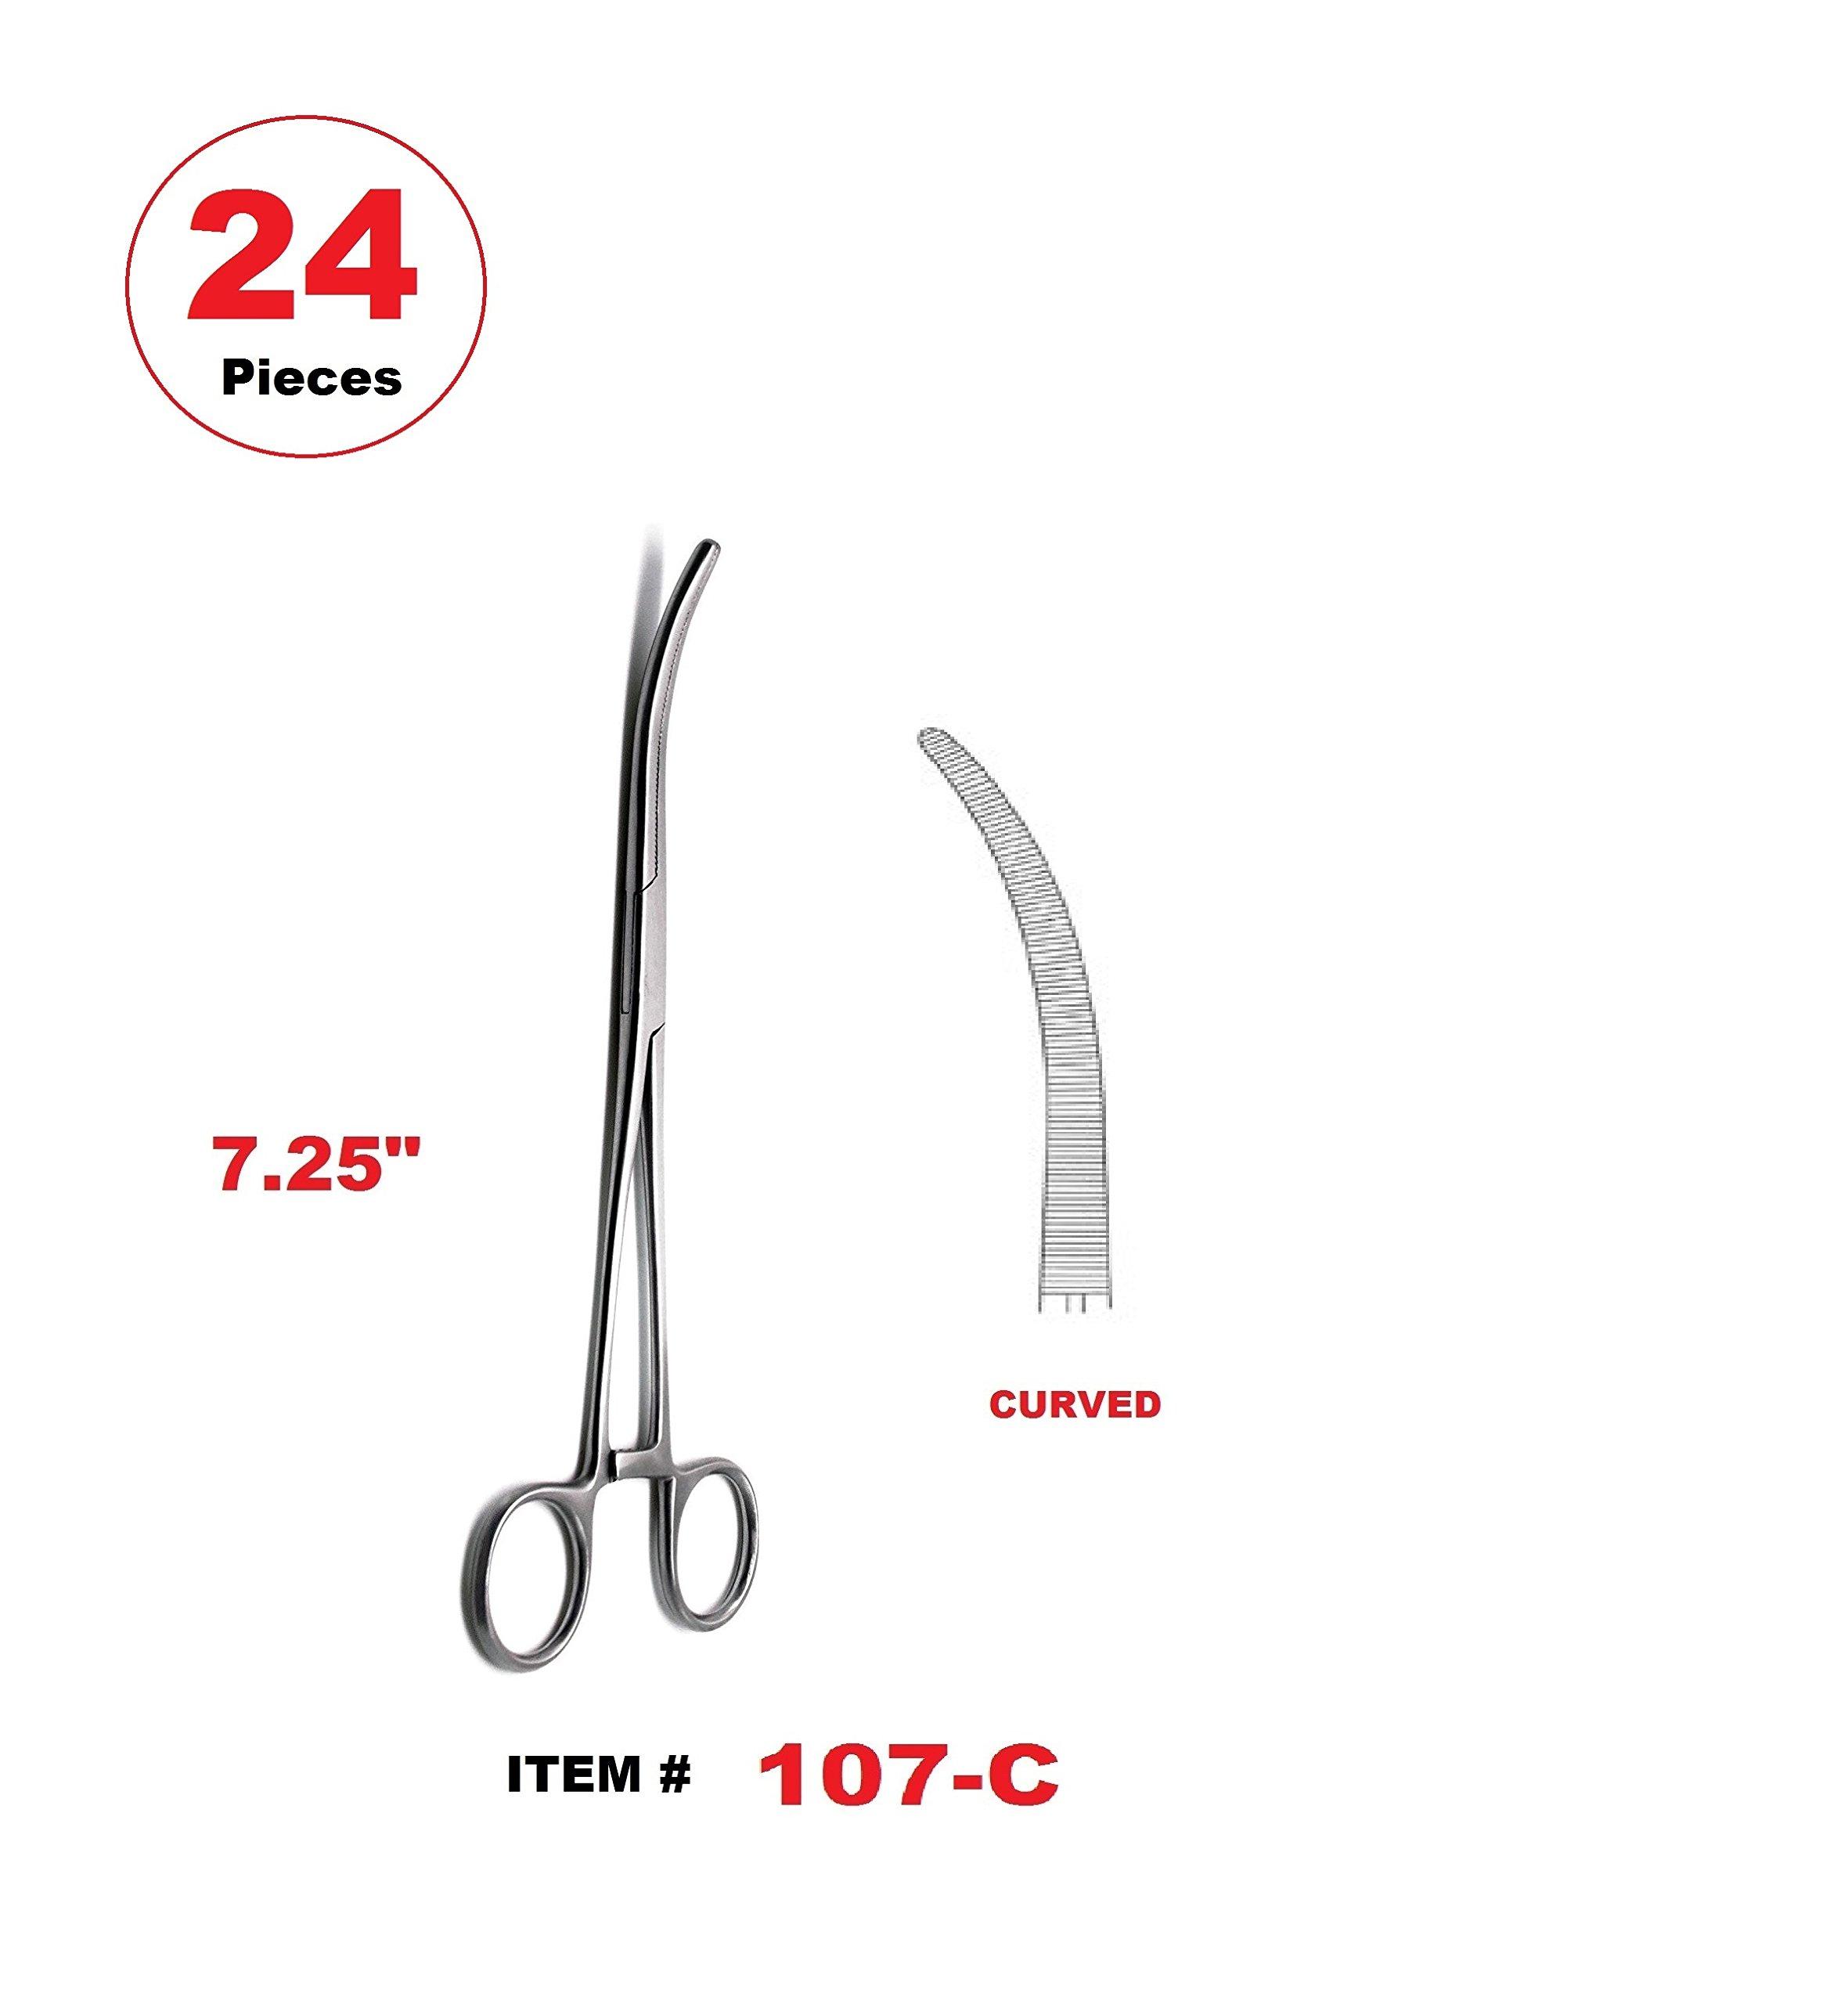 24 Pcs 7.25'' Pean Hemostat Locking Forceps Curved